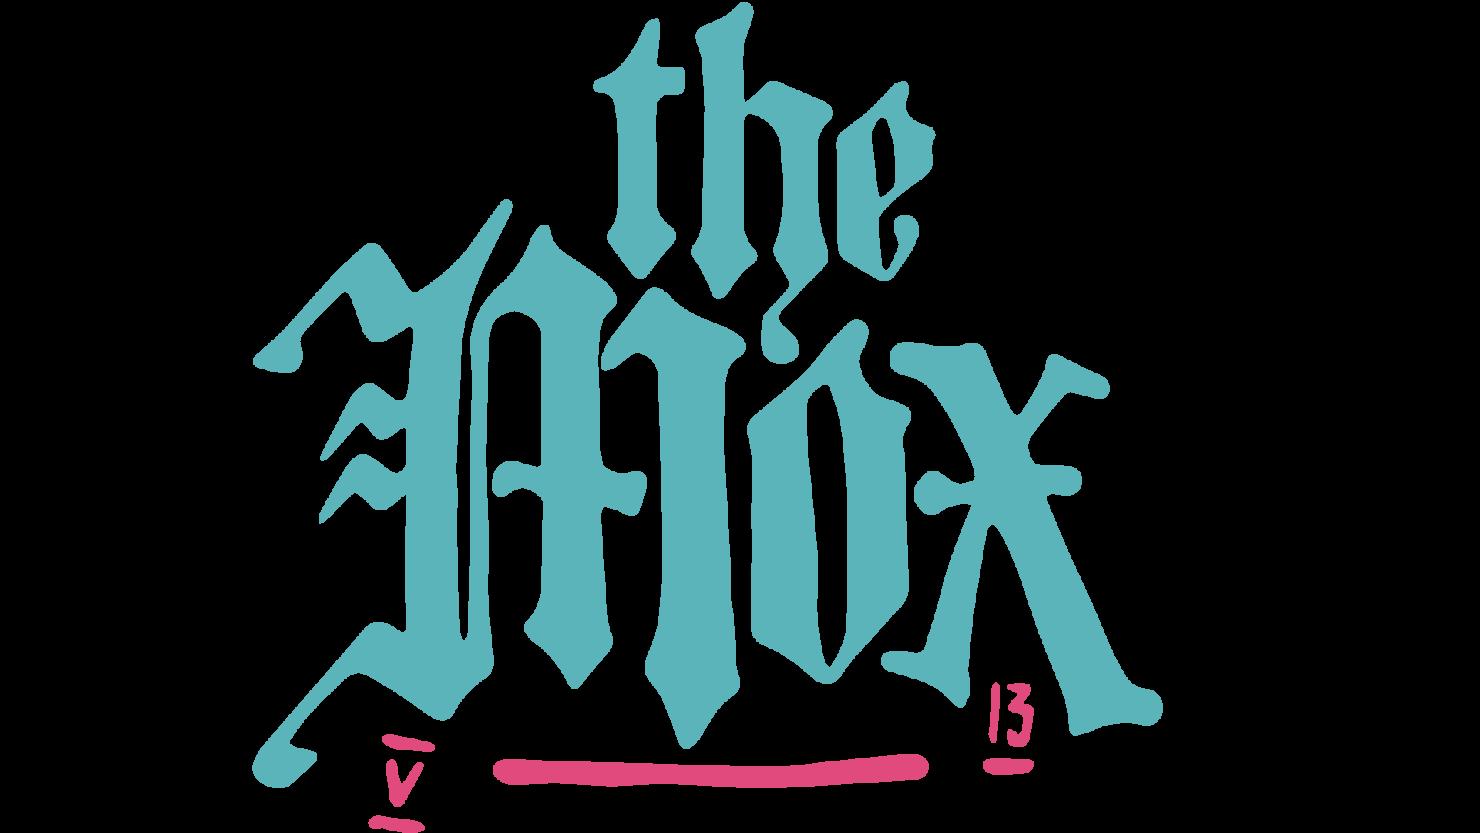 moxes_text_logotype